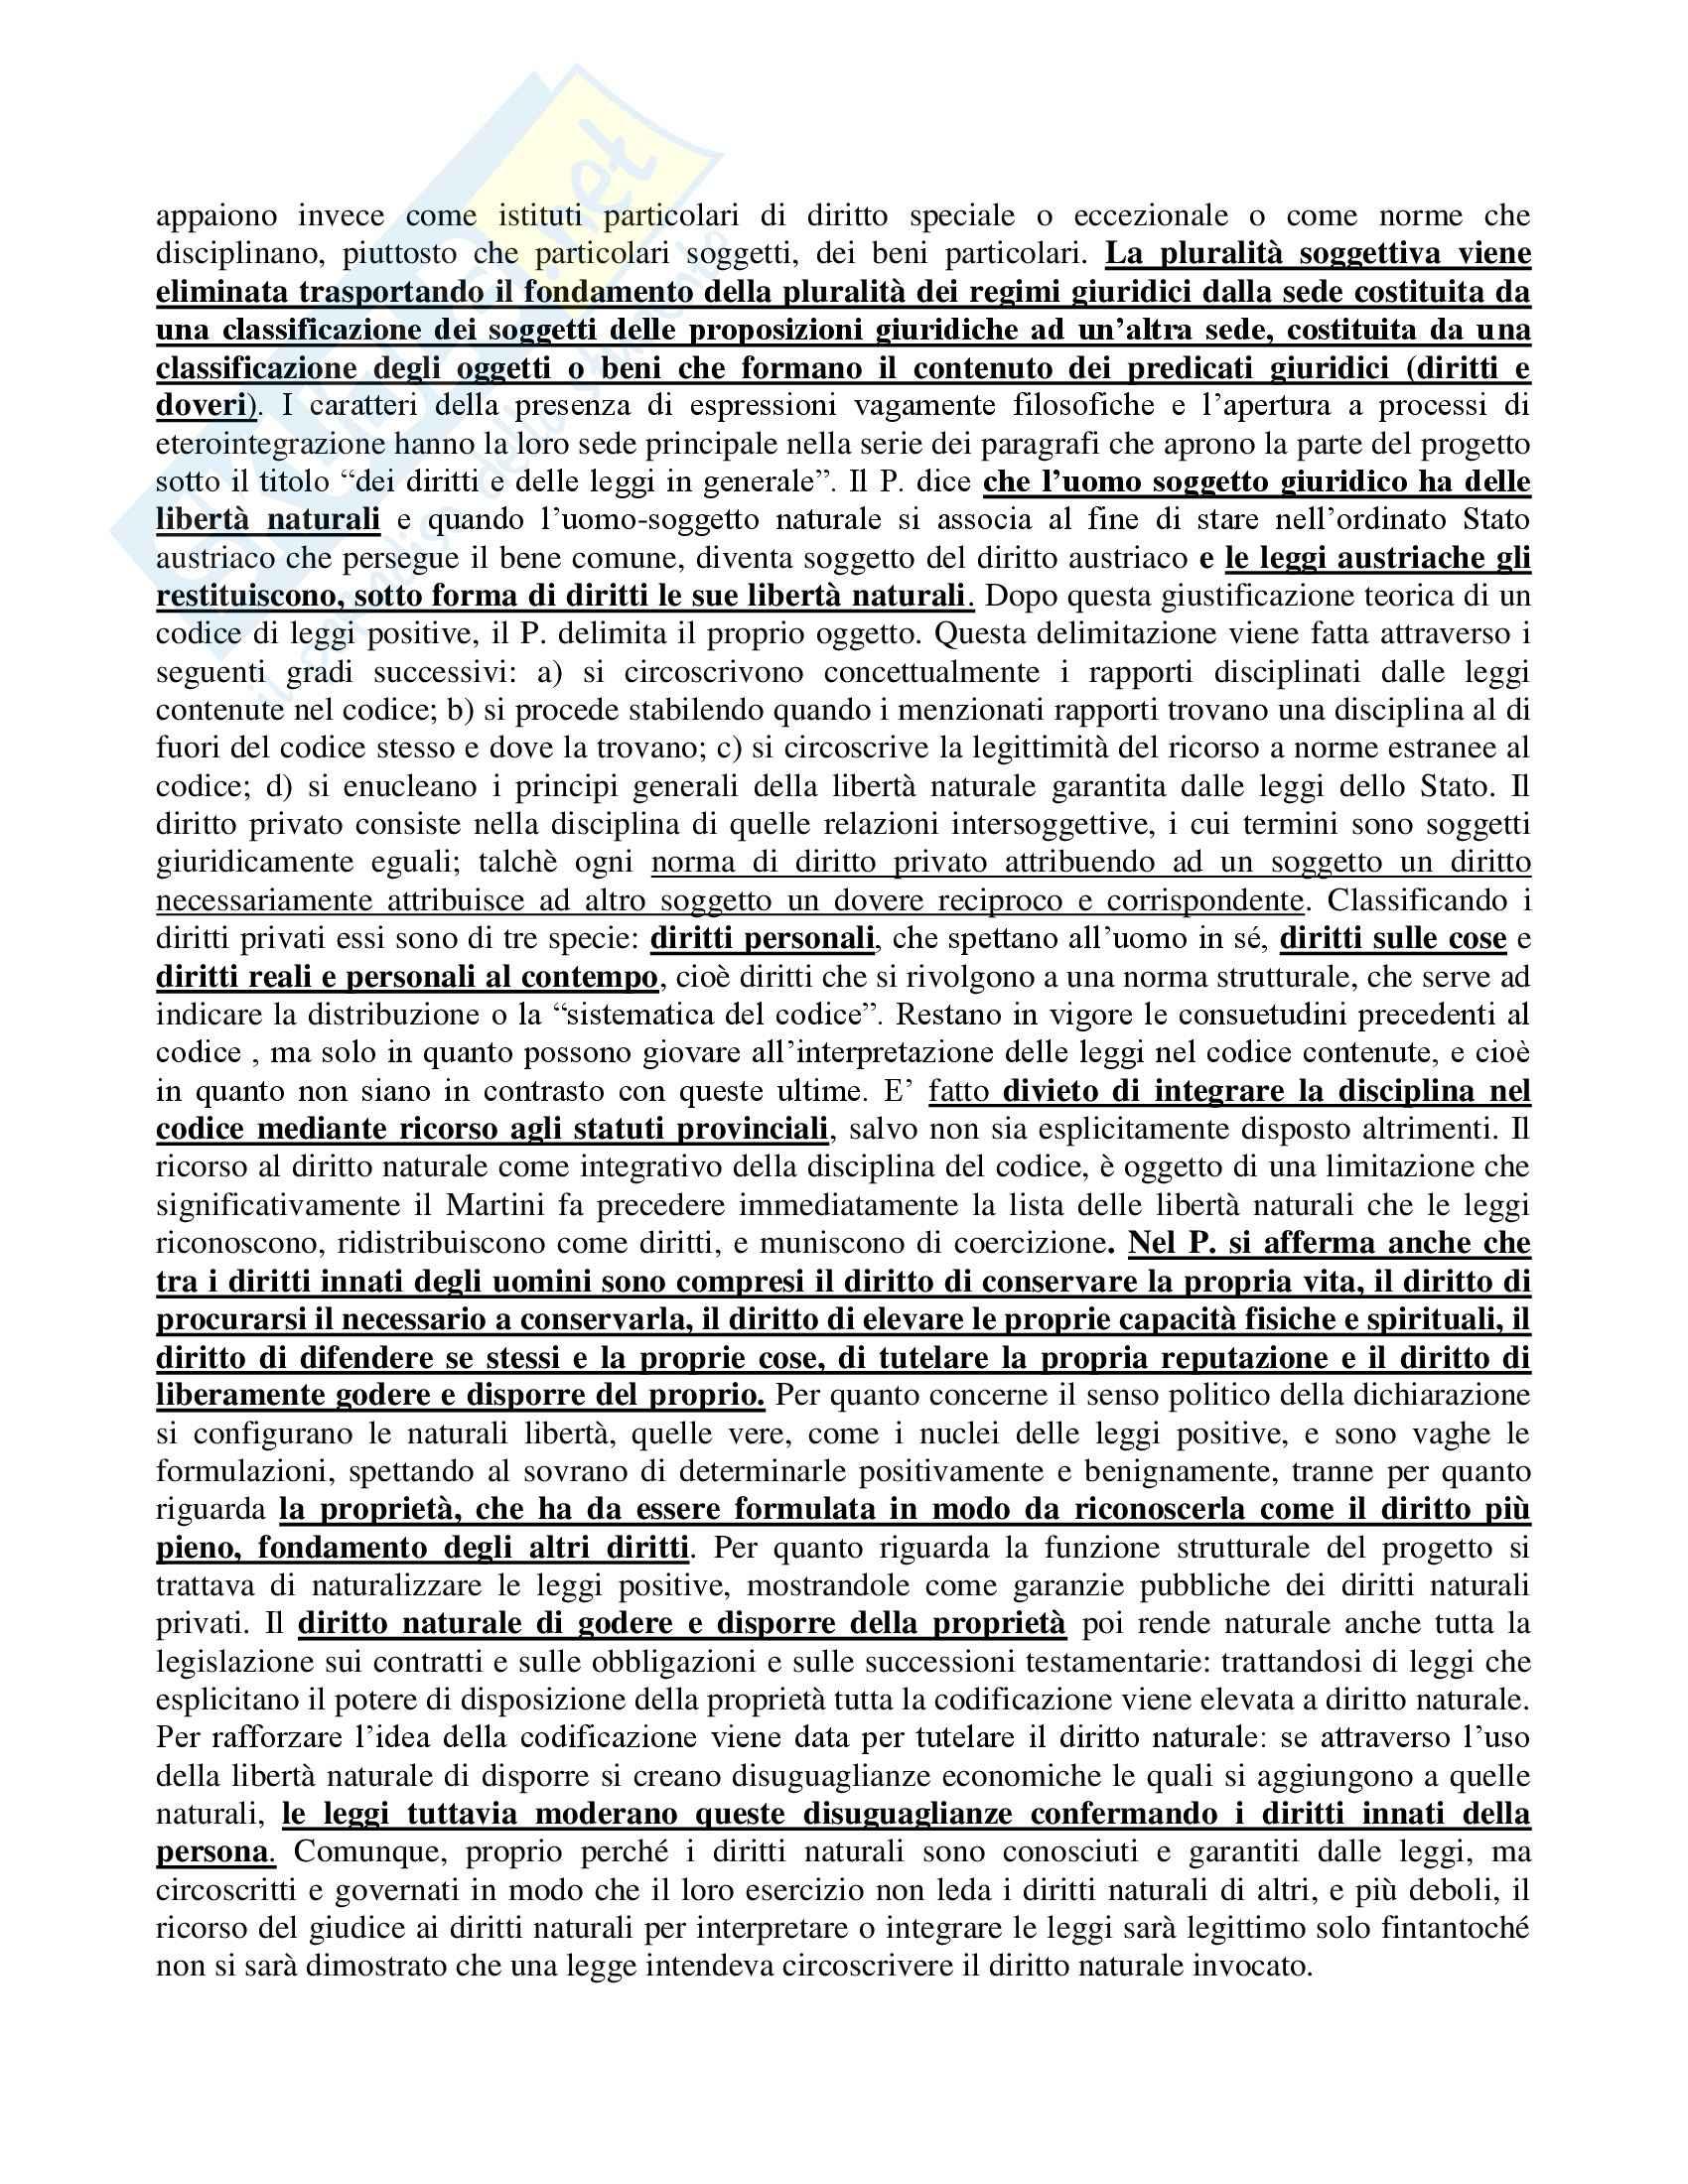 Storia del diritto medievale e moderno - parte Moderna Pag. 26